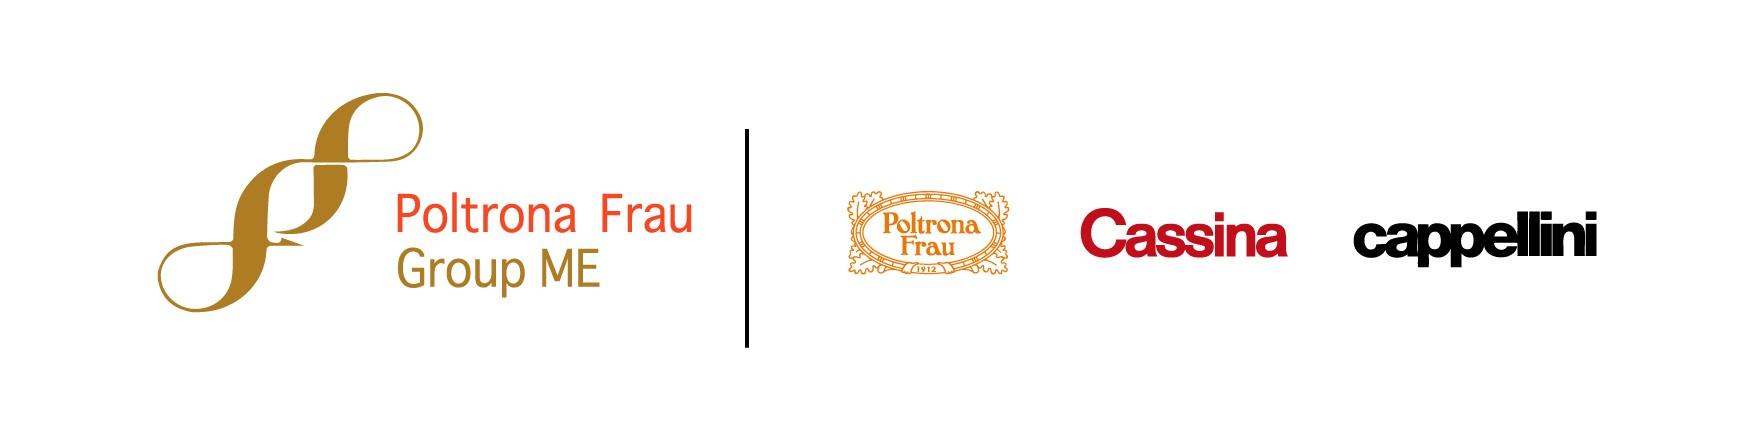 genuino selezione straordinaria Acquista i più venduti POLTRONA FRAU Group ME | LinkedIn